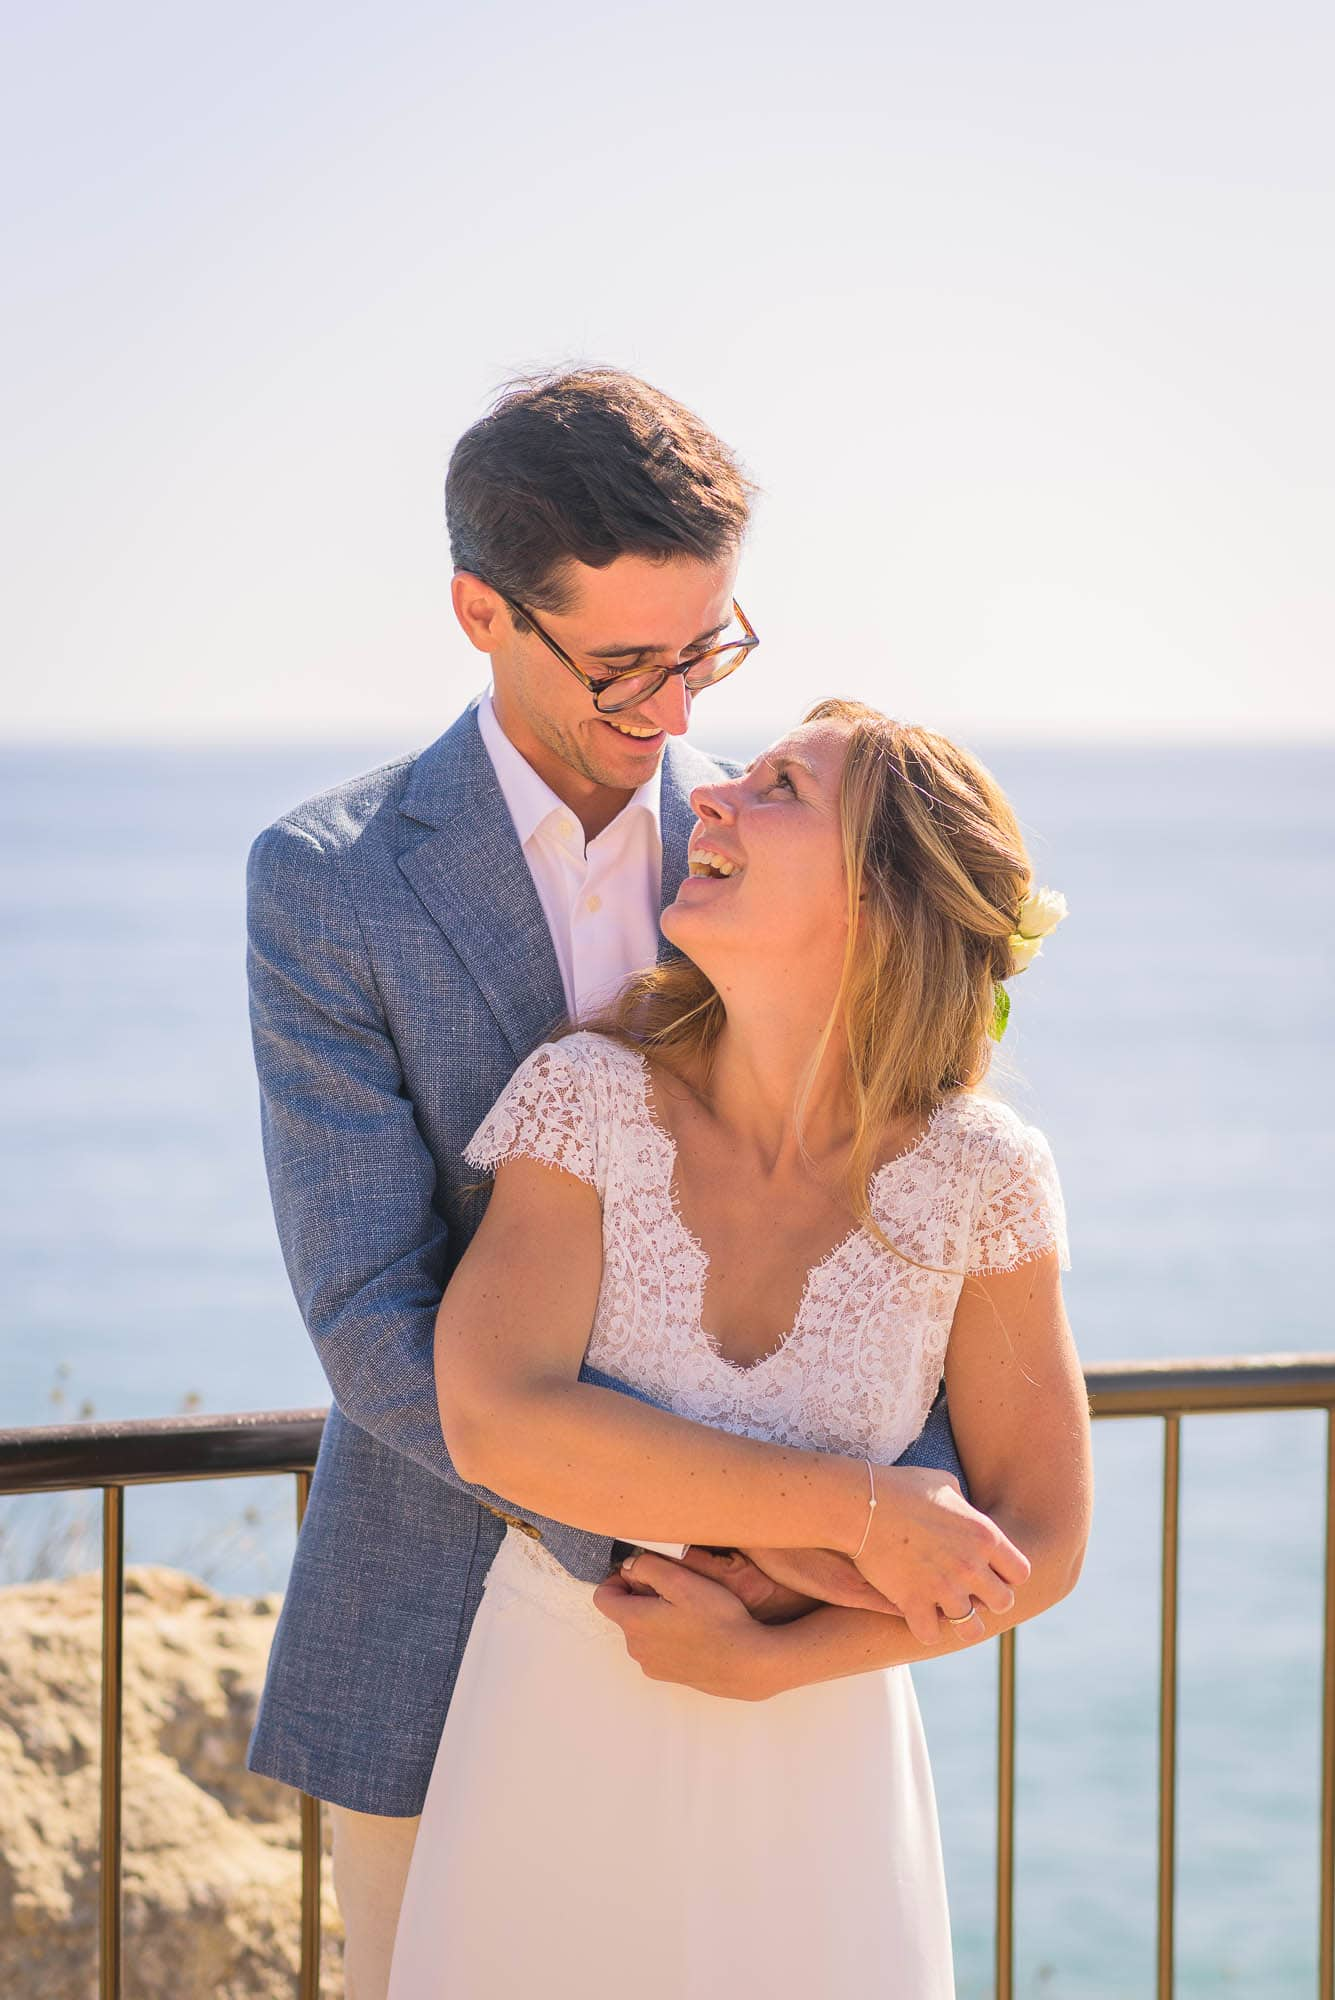 044_Alan_and_Heidi_Wedding_Verena_Andreas